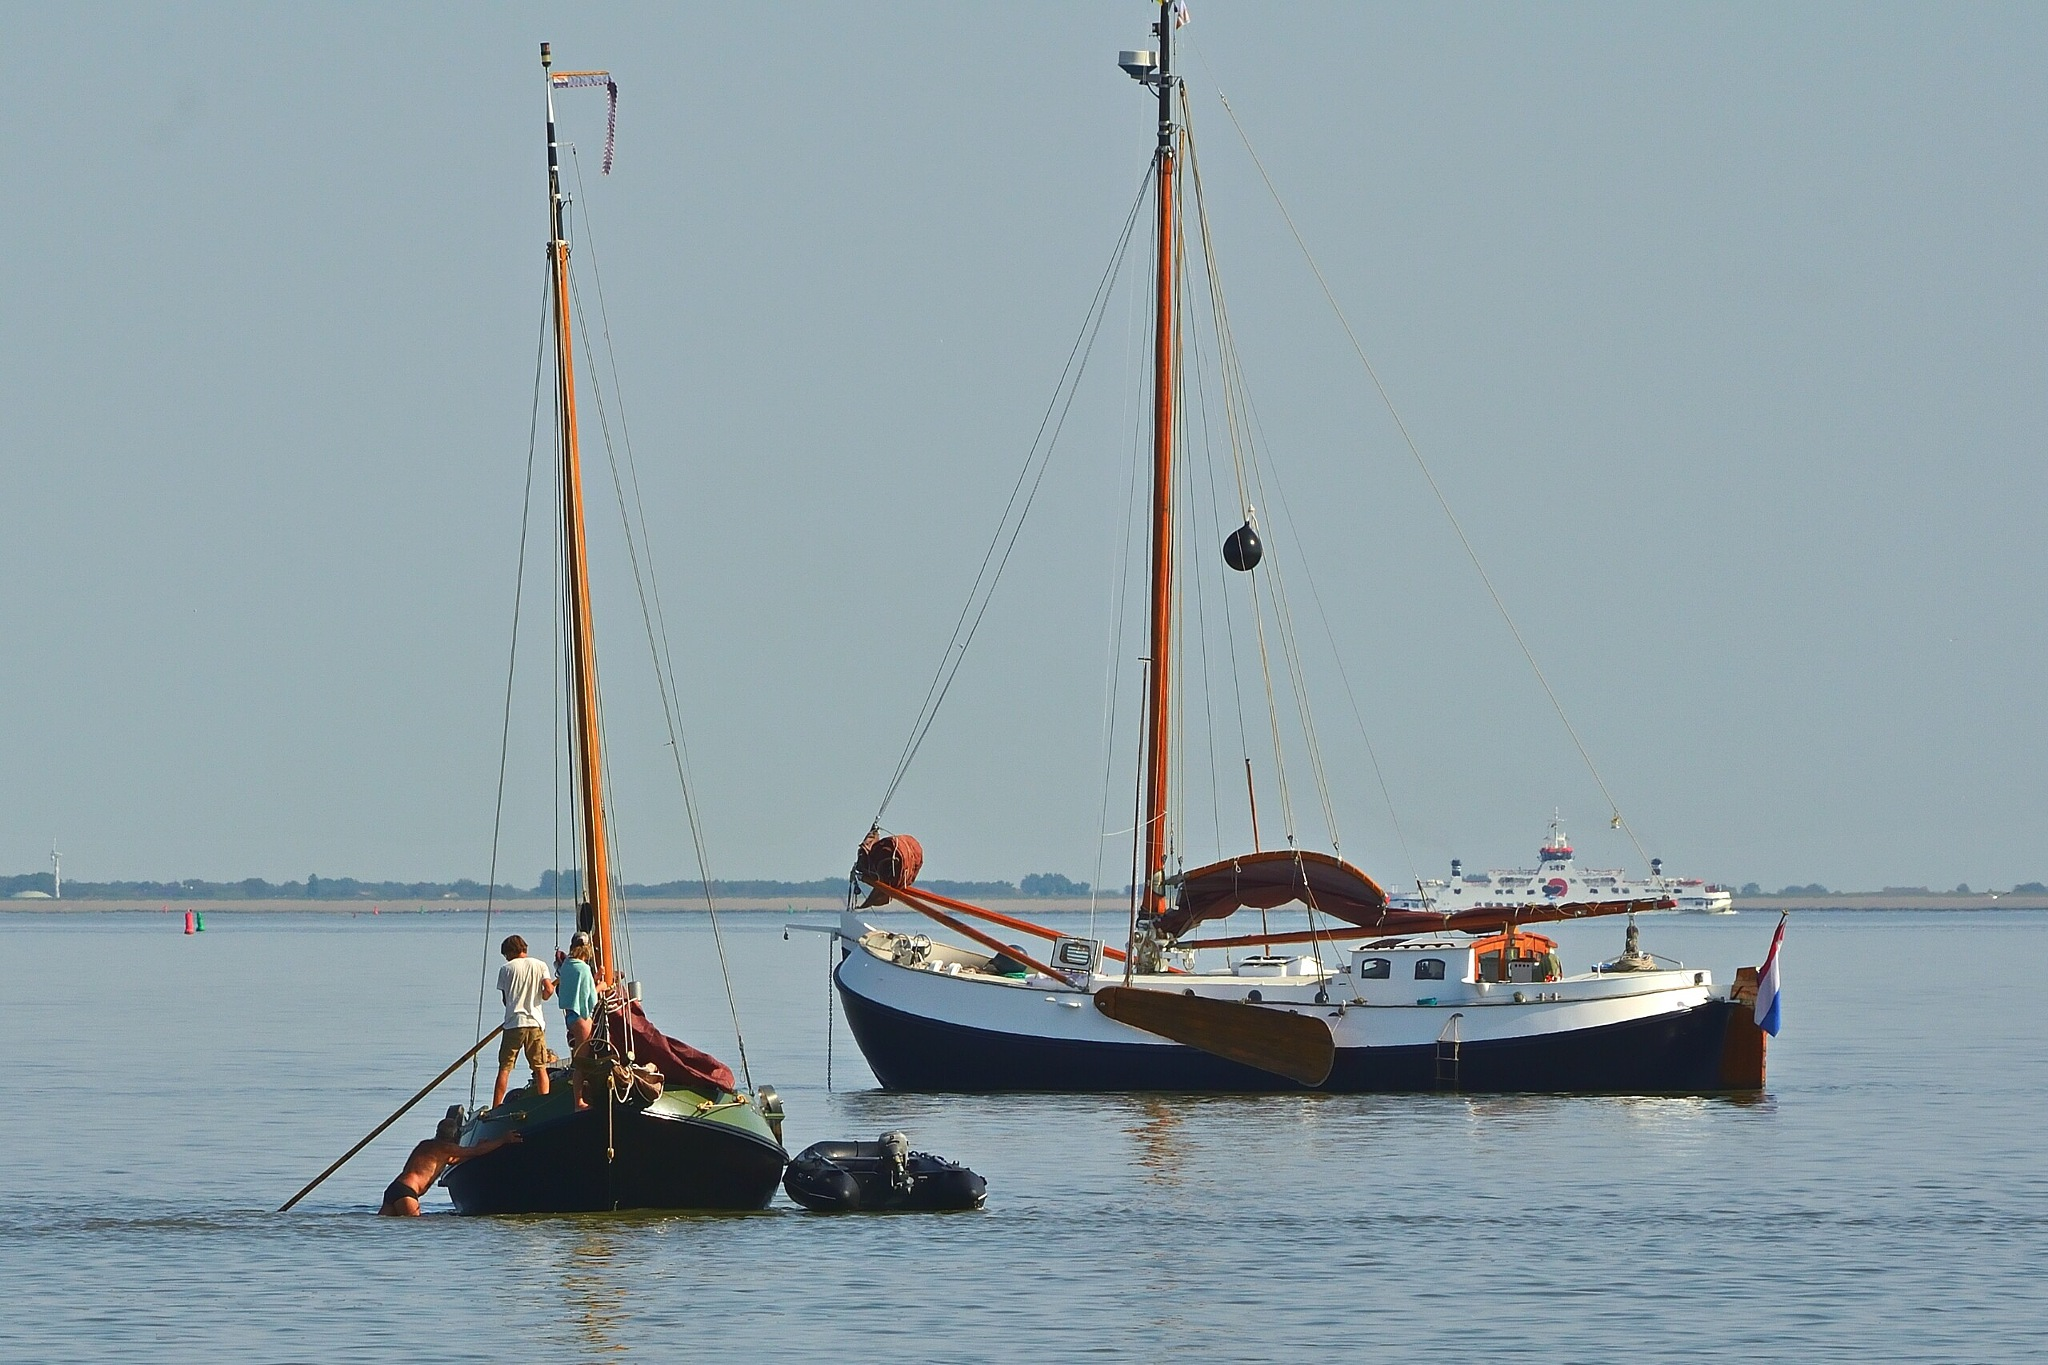 Waddenzee bij Ameland  by Henk Meima